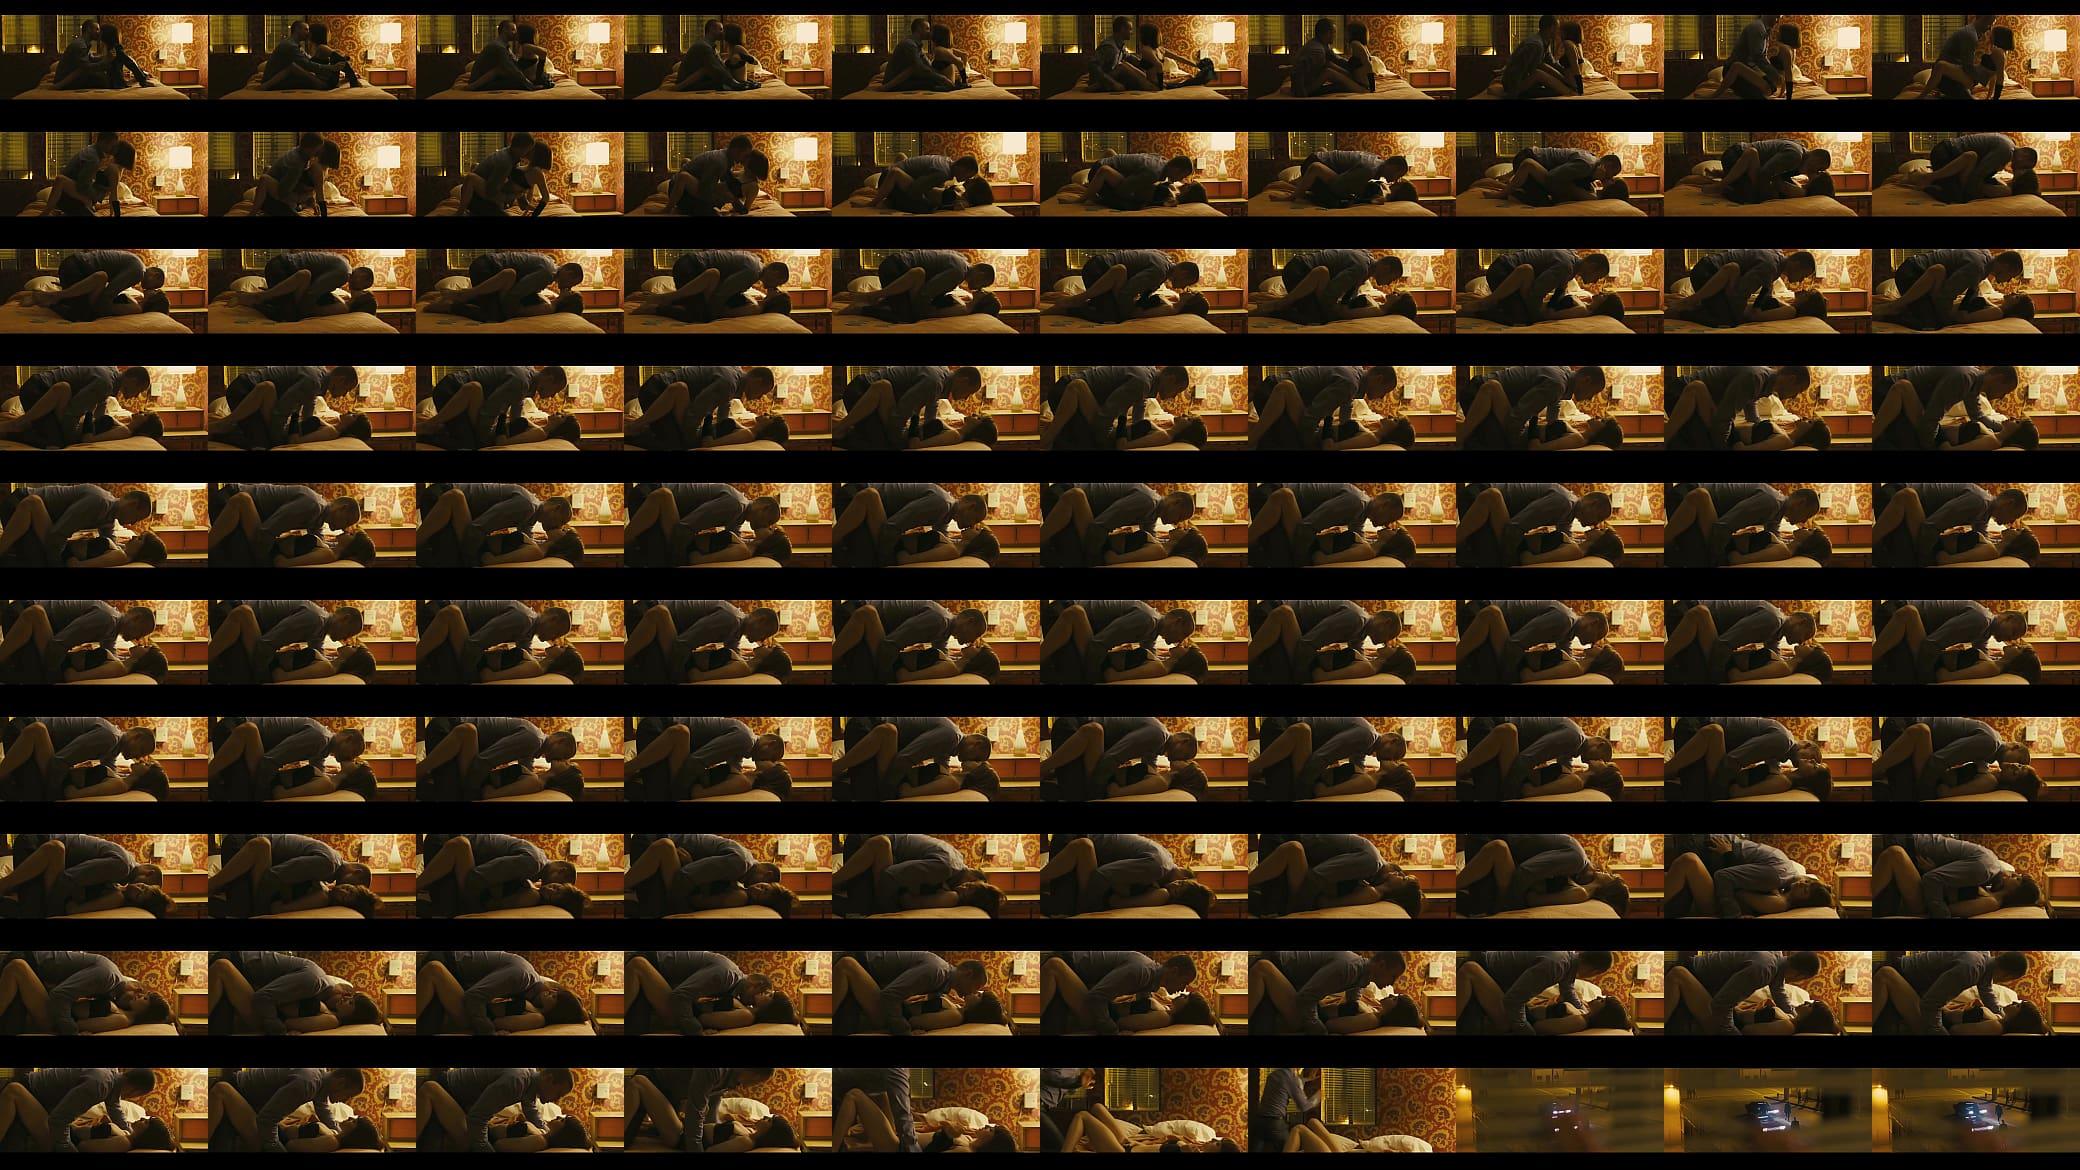 Amanda Seyfried Nude Big Love amanda seyfried in in time - xvideos